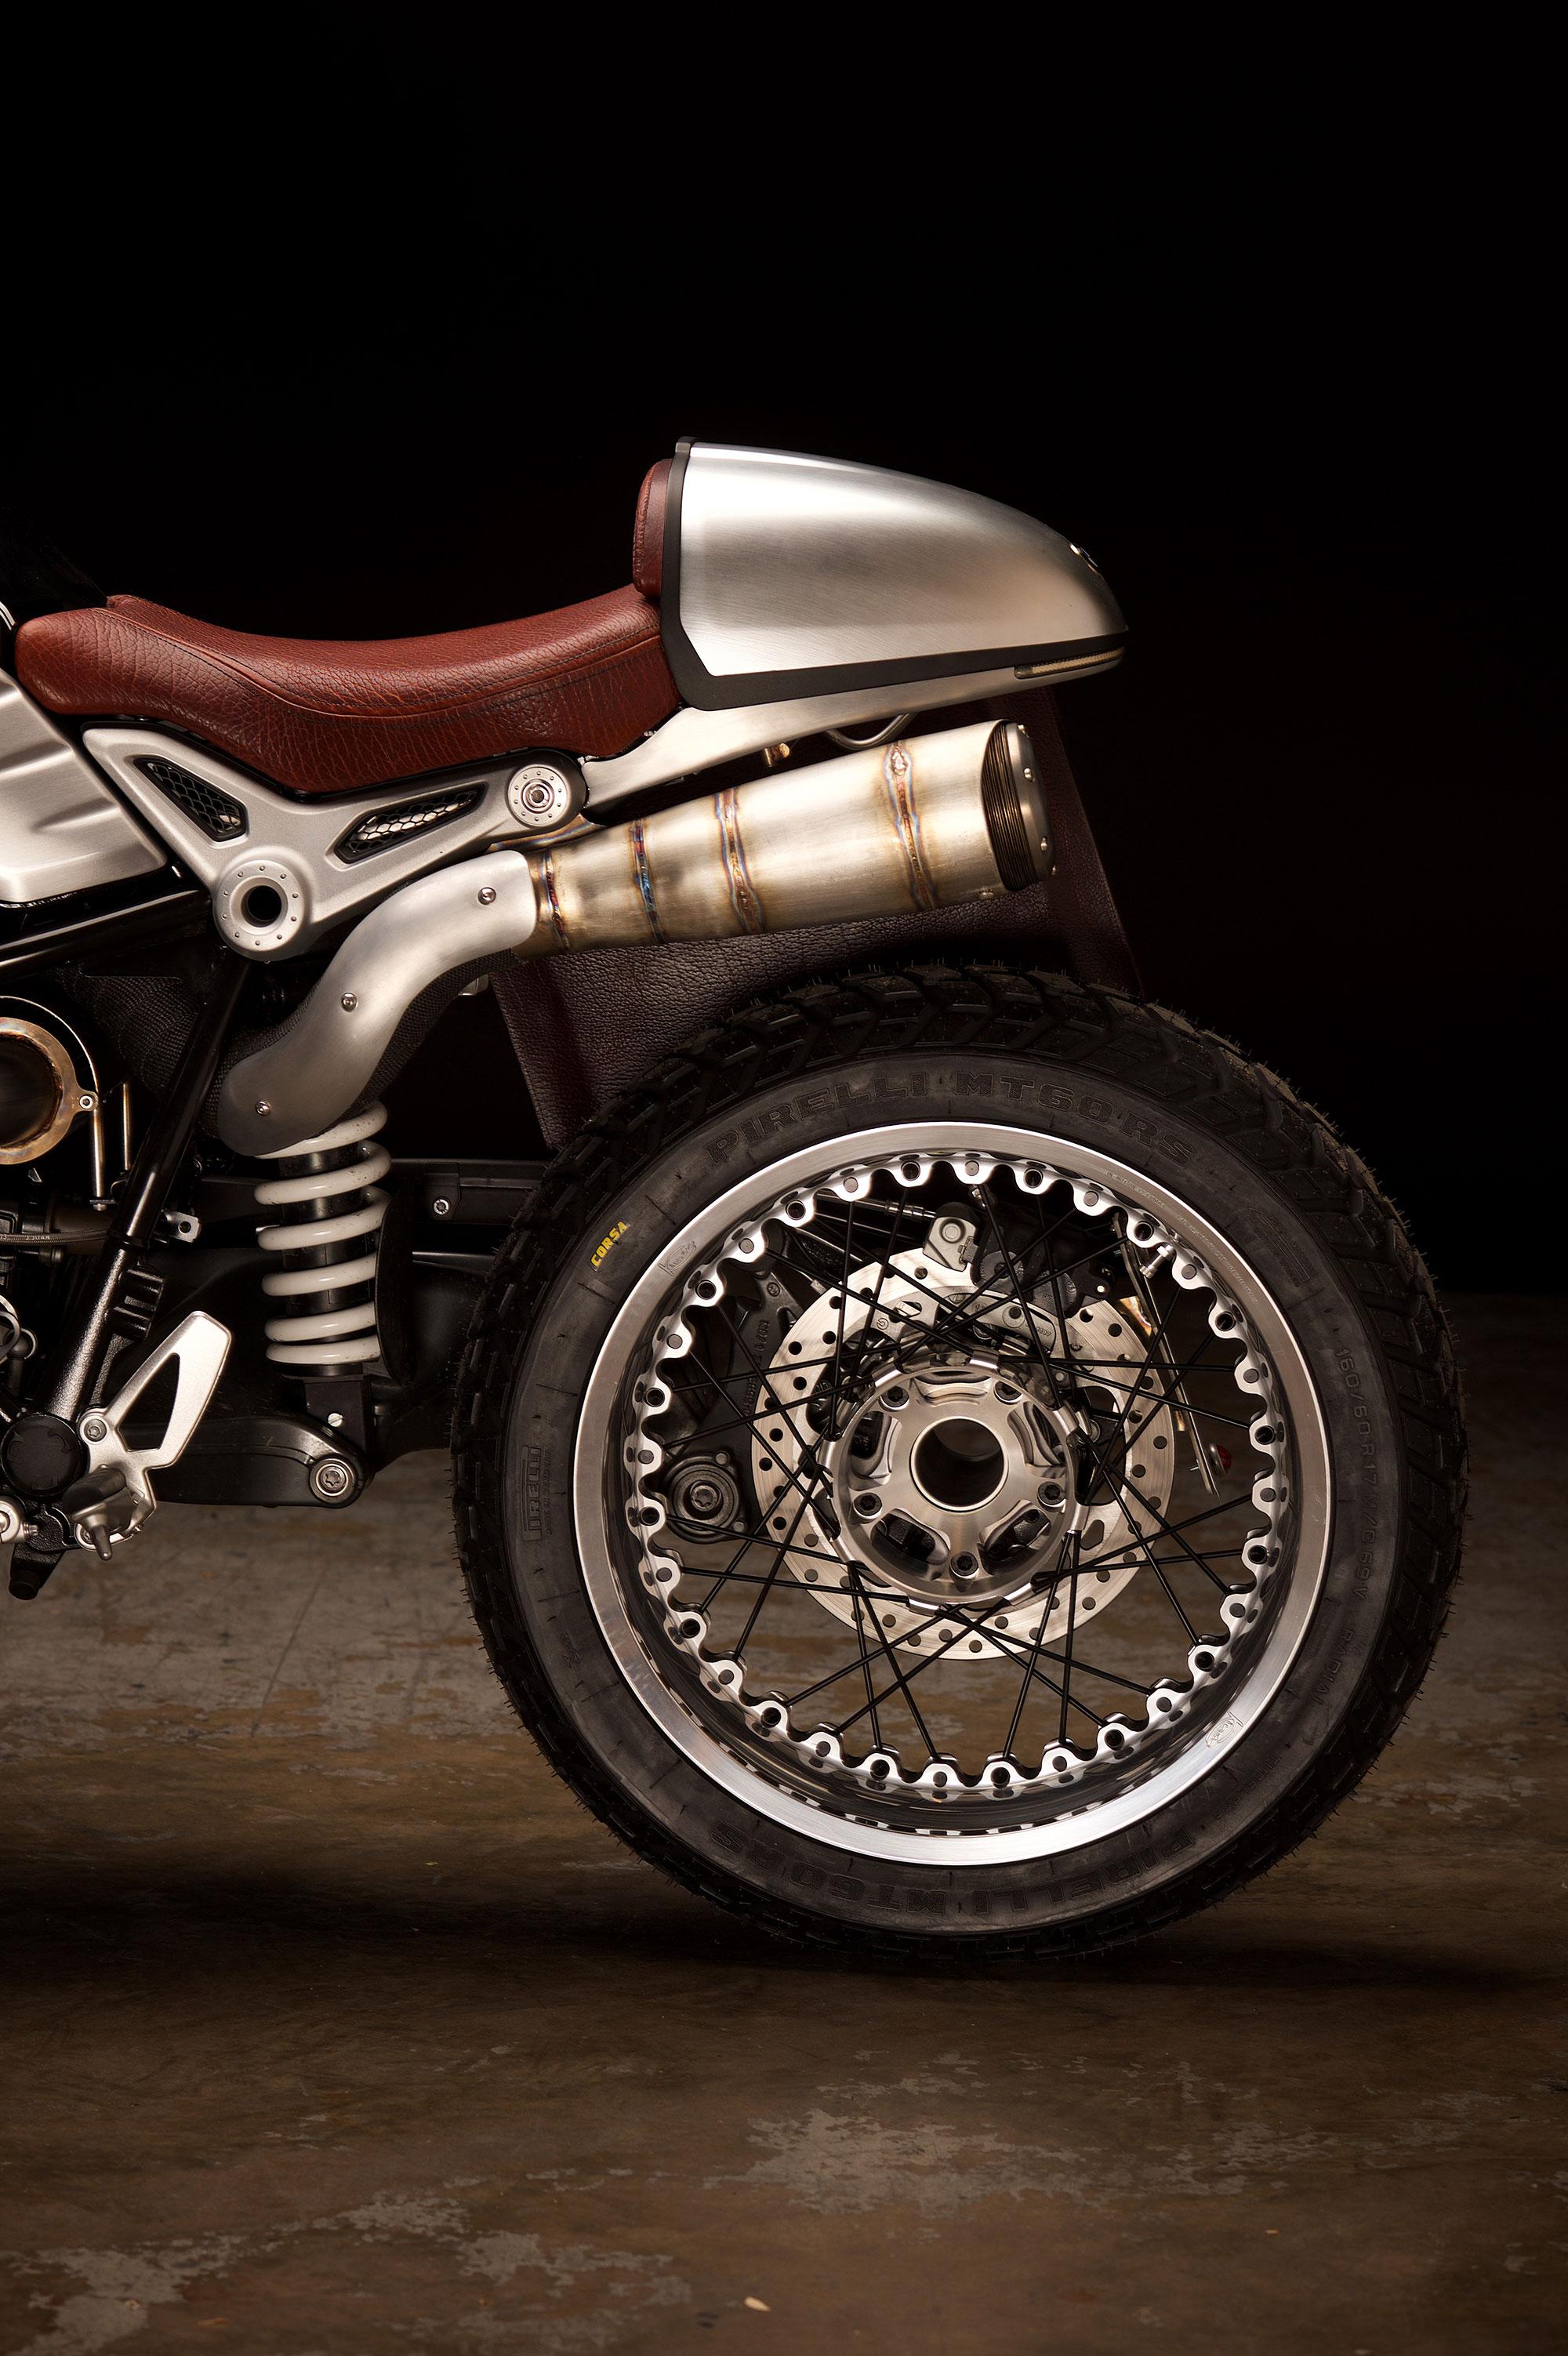 Revival-Cycles-Custom-Build-2014-BMW-RNineT-v2-058-2000w.jpg